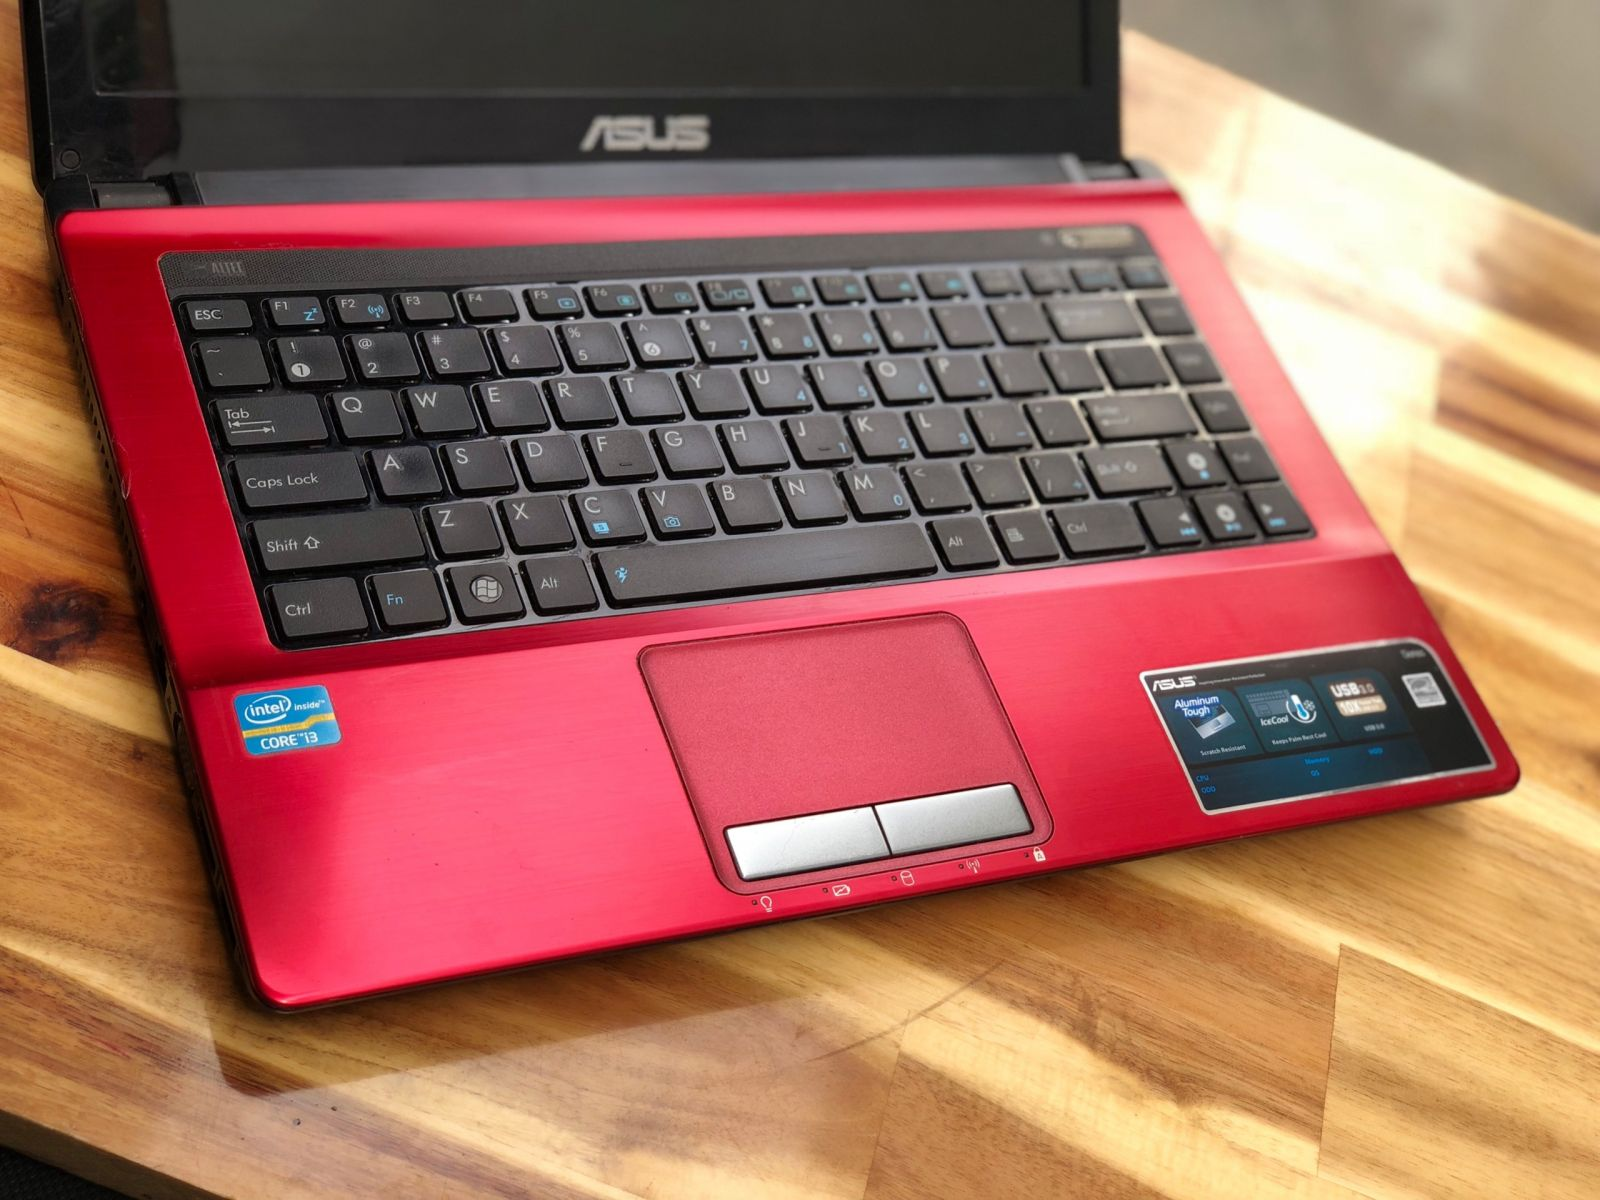 laptop-asus-van-phong-hoc-tap-gia-re-3